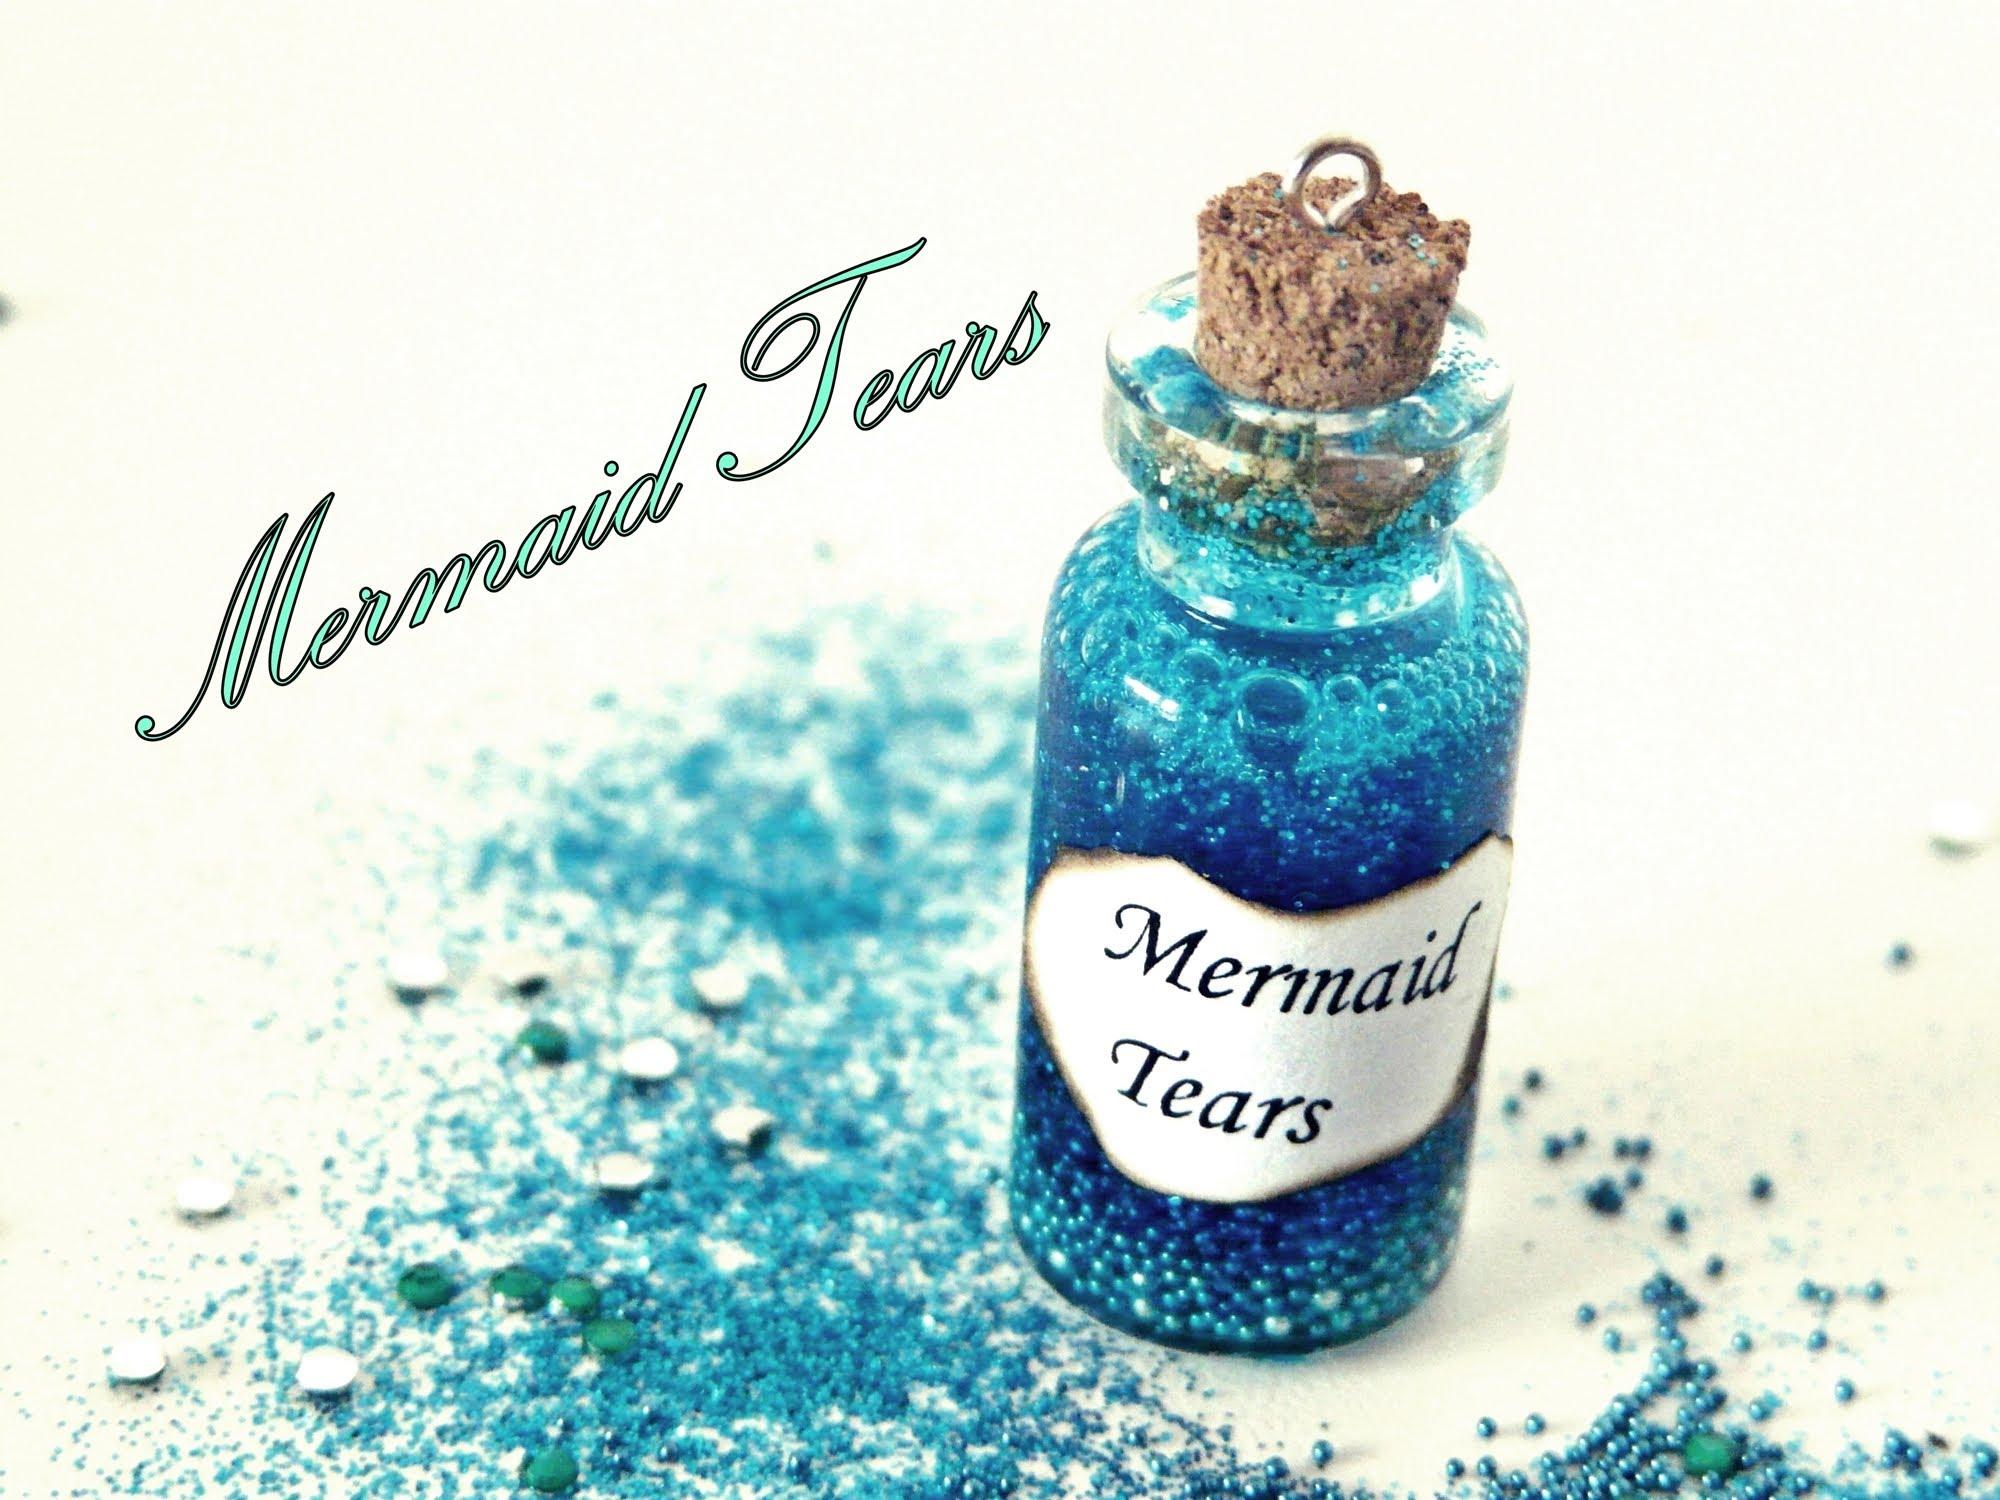 Mermaid Tears Miniature Bottle Charm - YouTube